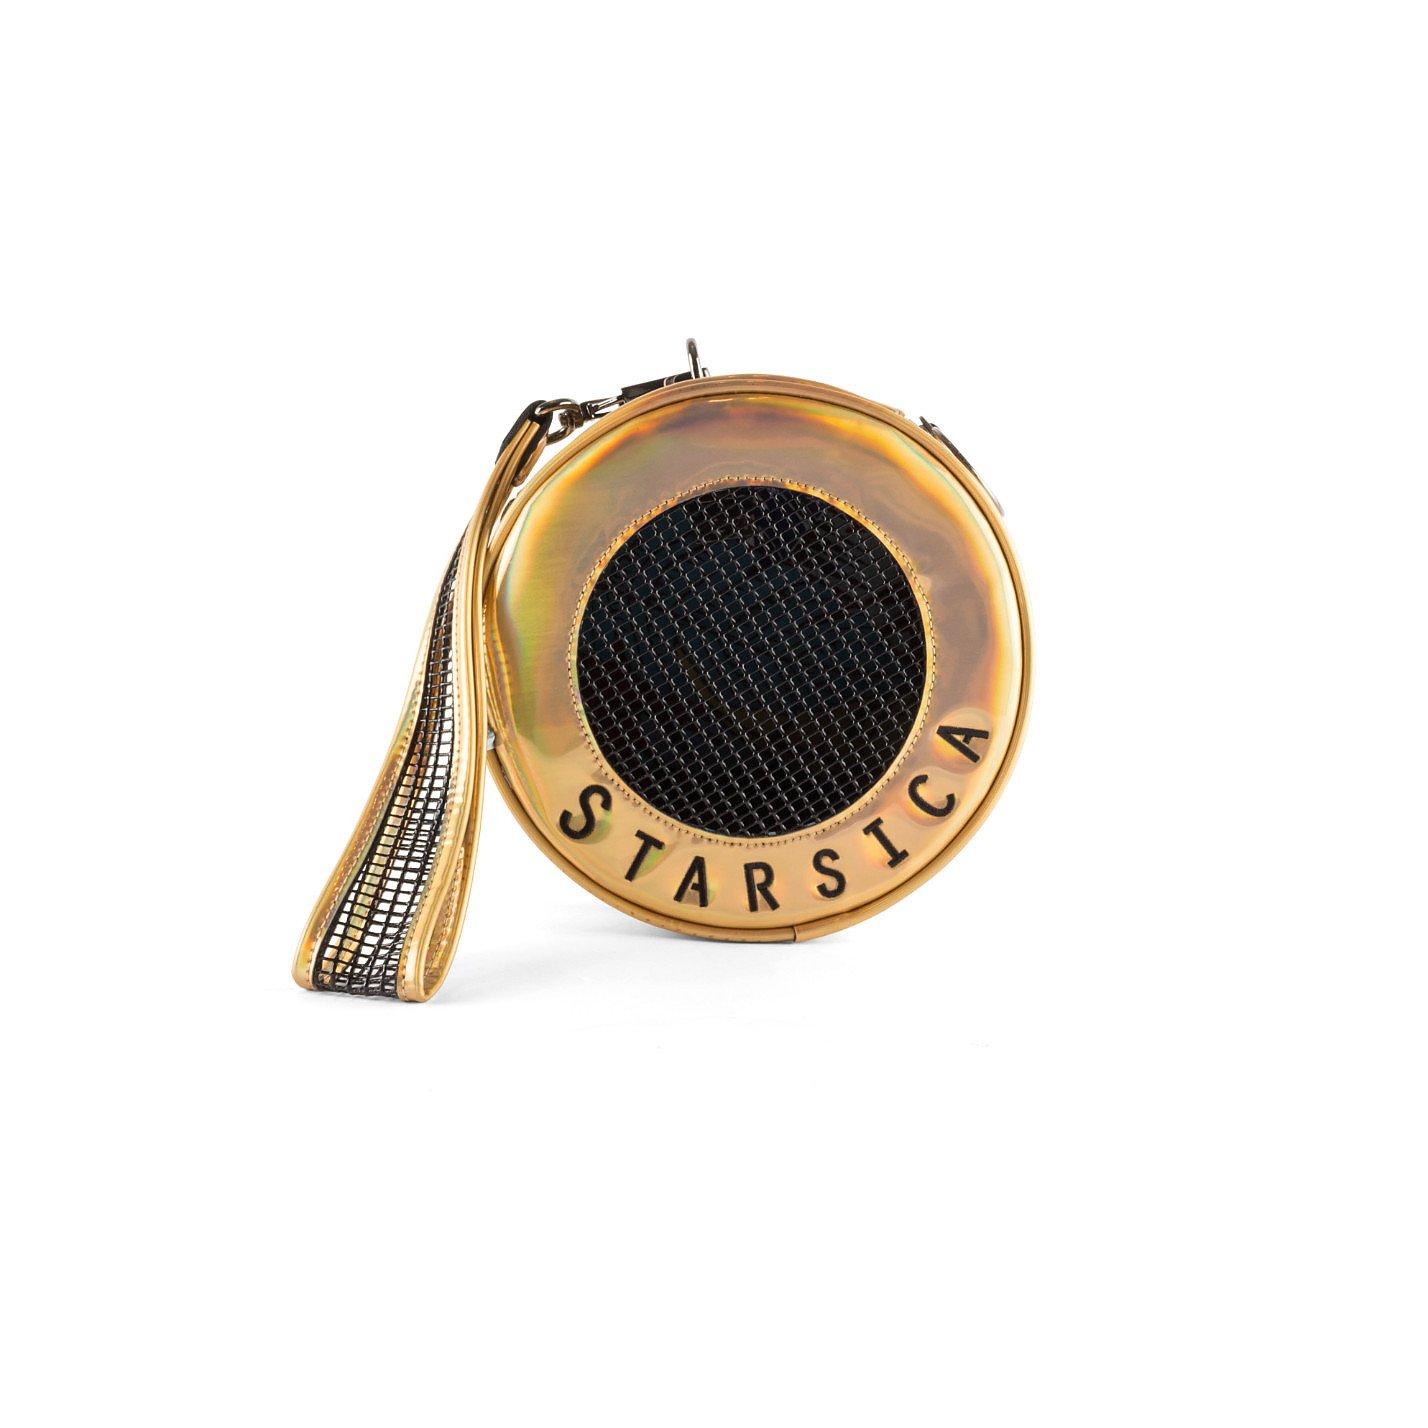 Starsica Gold Circle Bag